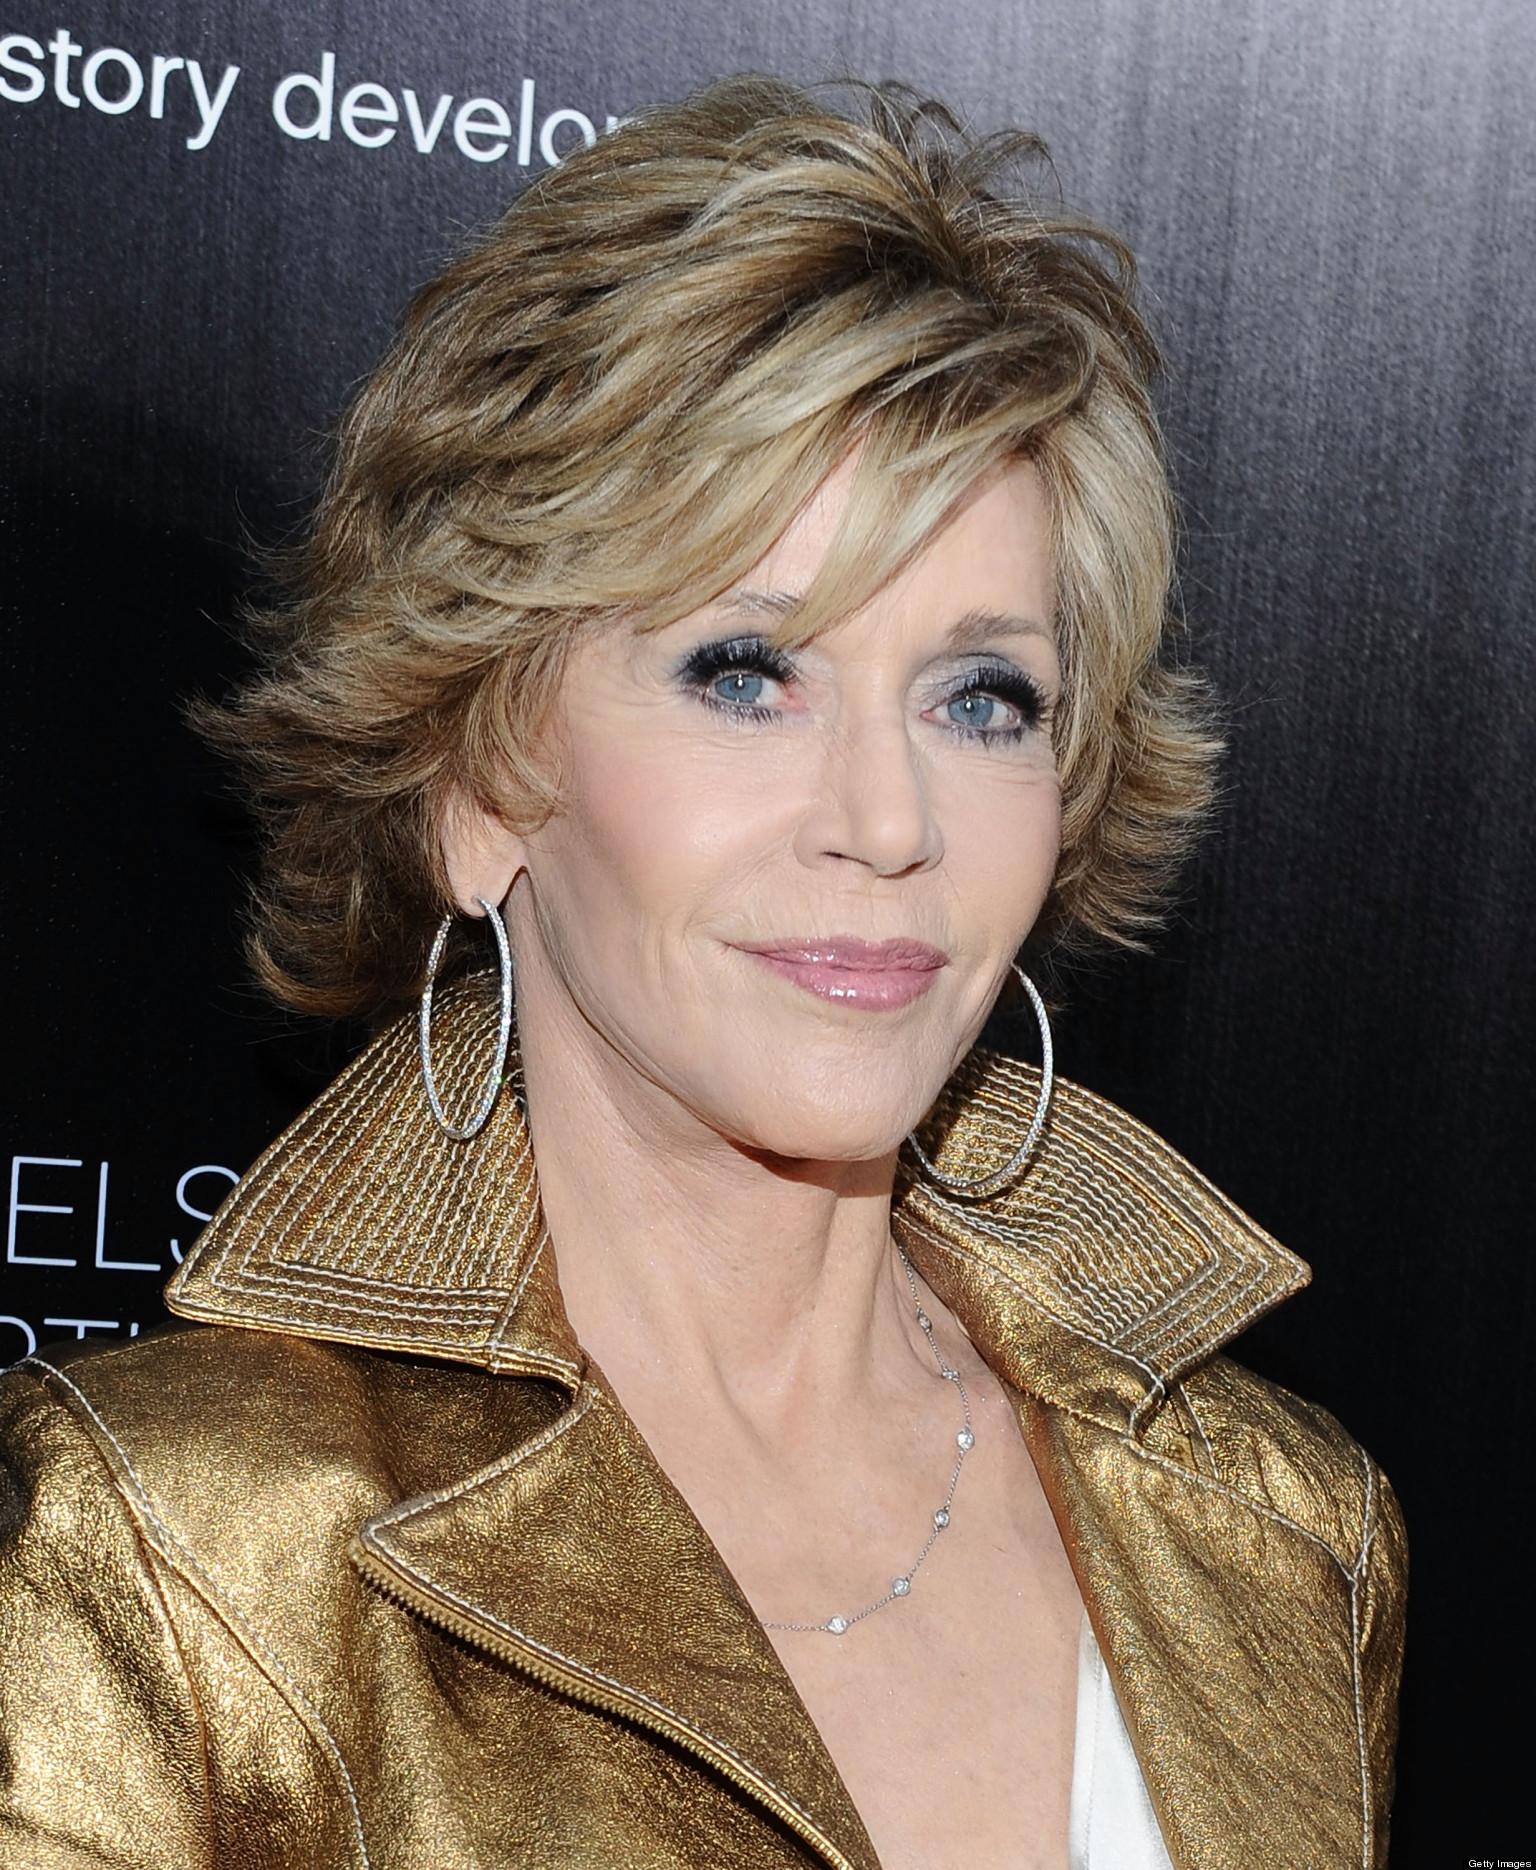 Jane Fonda Sells Hollywood House For 85 Million PHOTOS